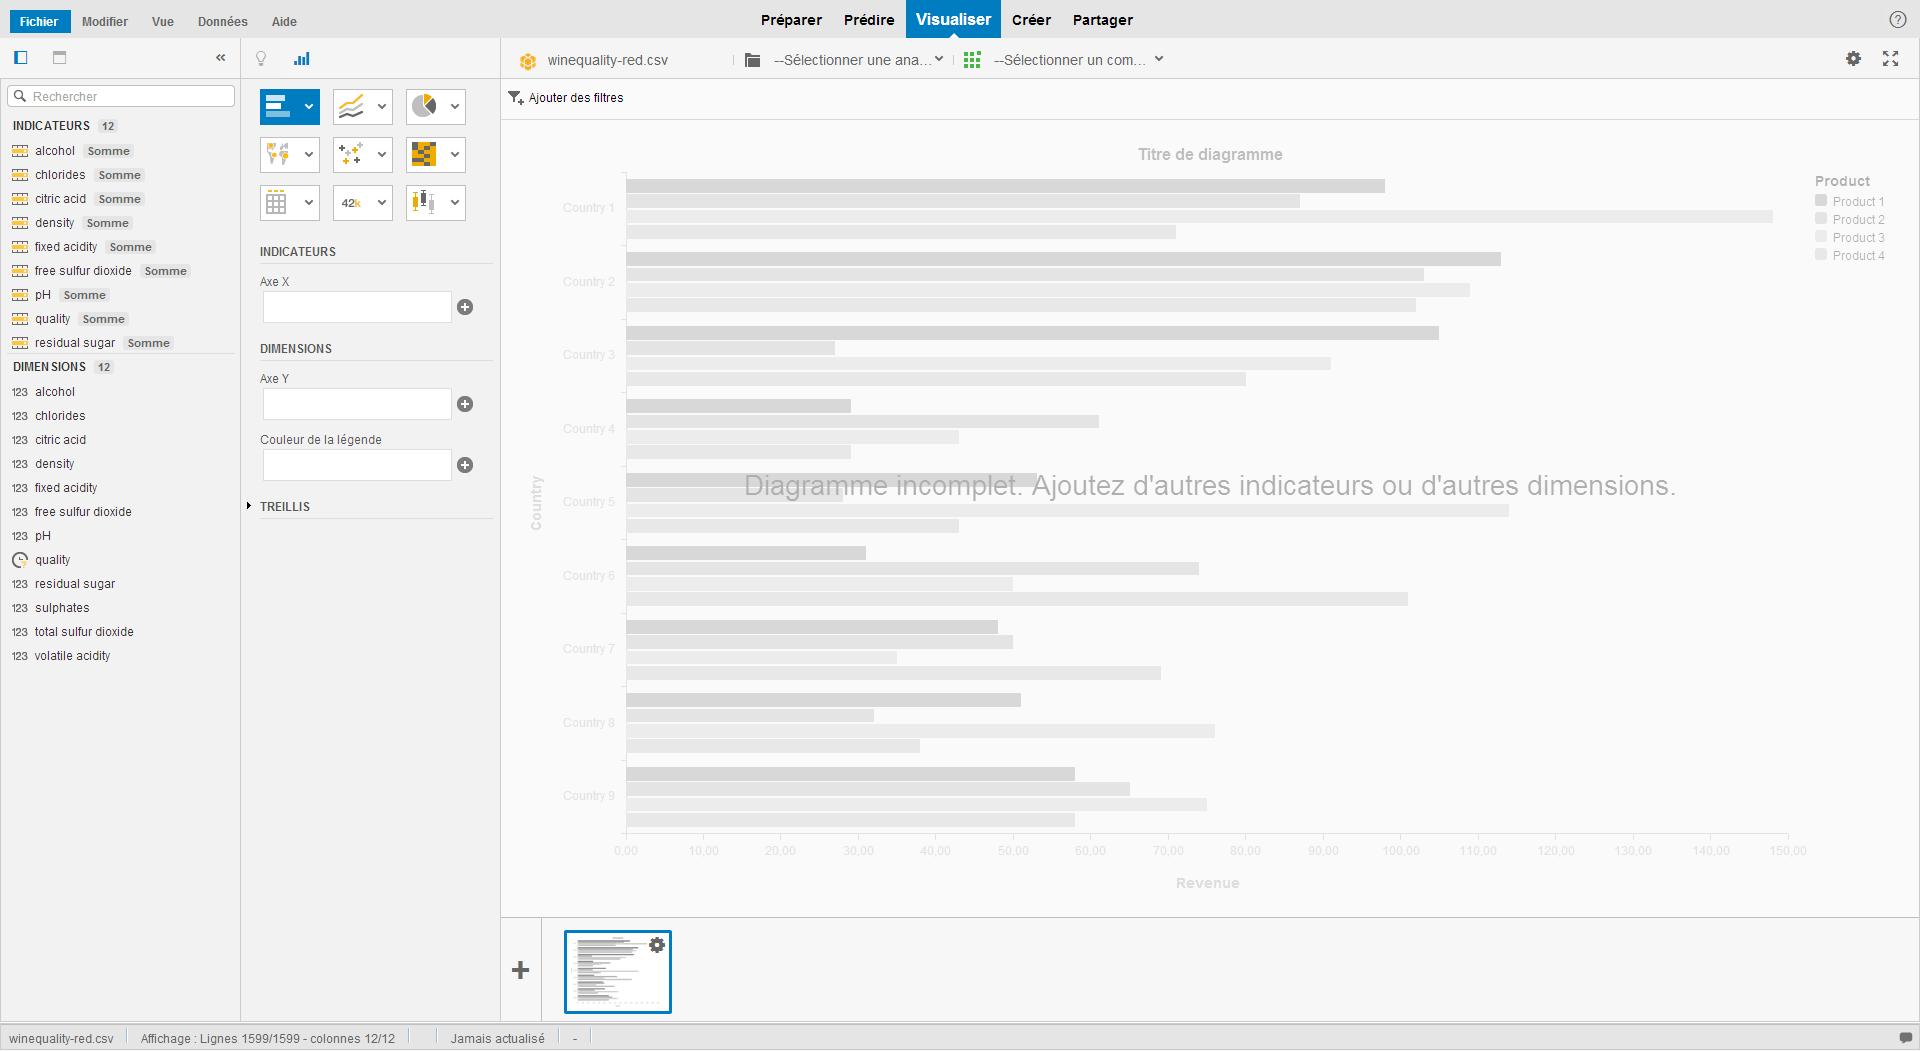 SAP Predictive Analysis - Intégrer un fichier CSV 6